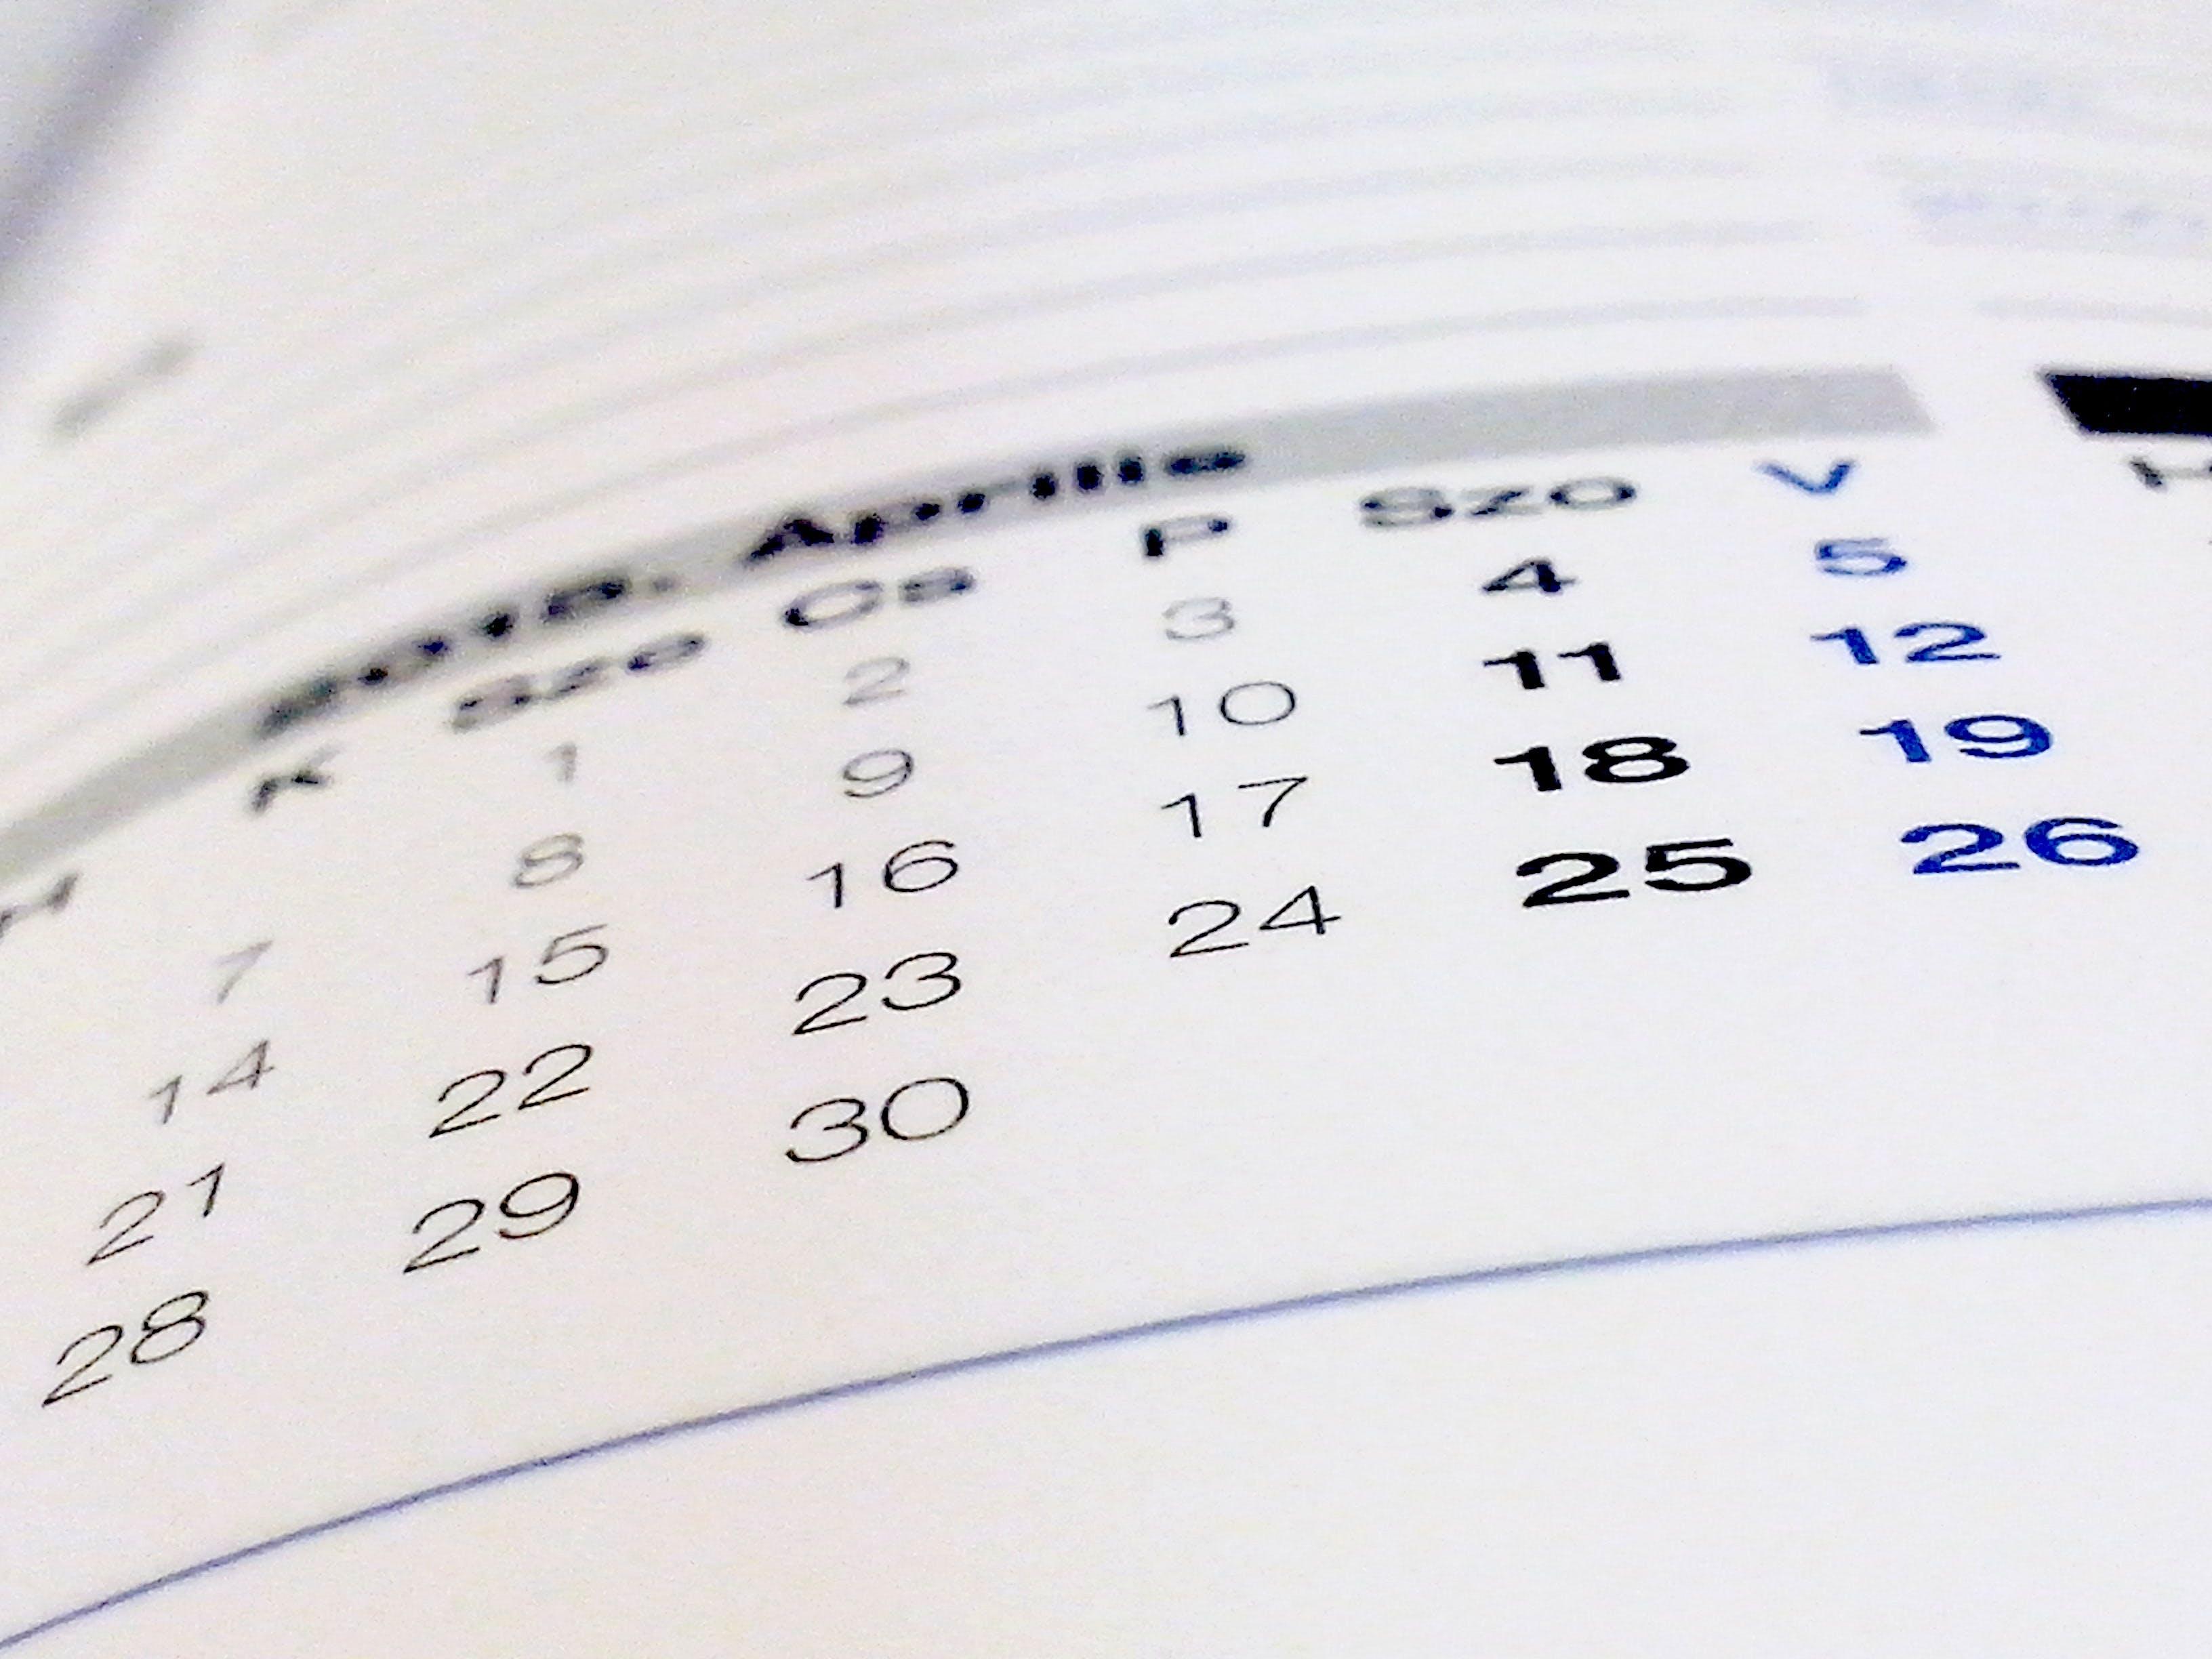 Free stock photo of calendar, book, paper